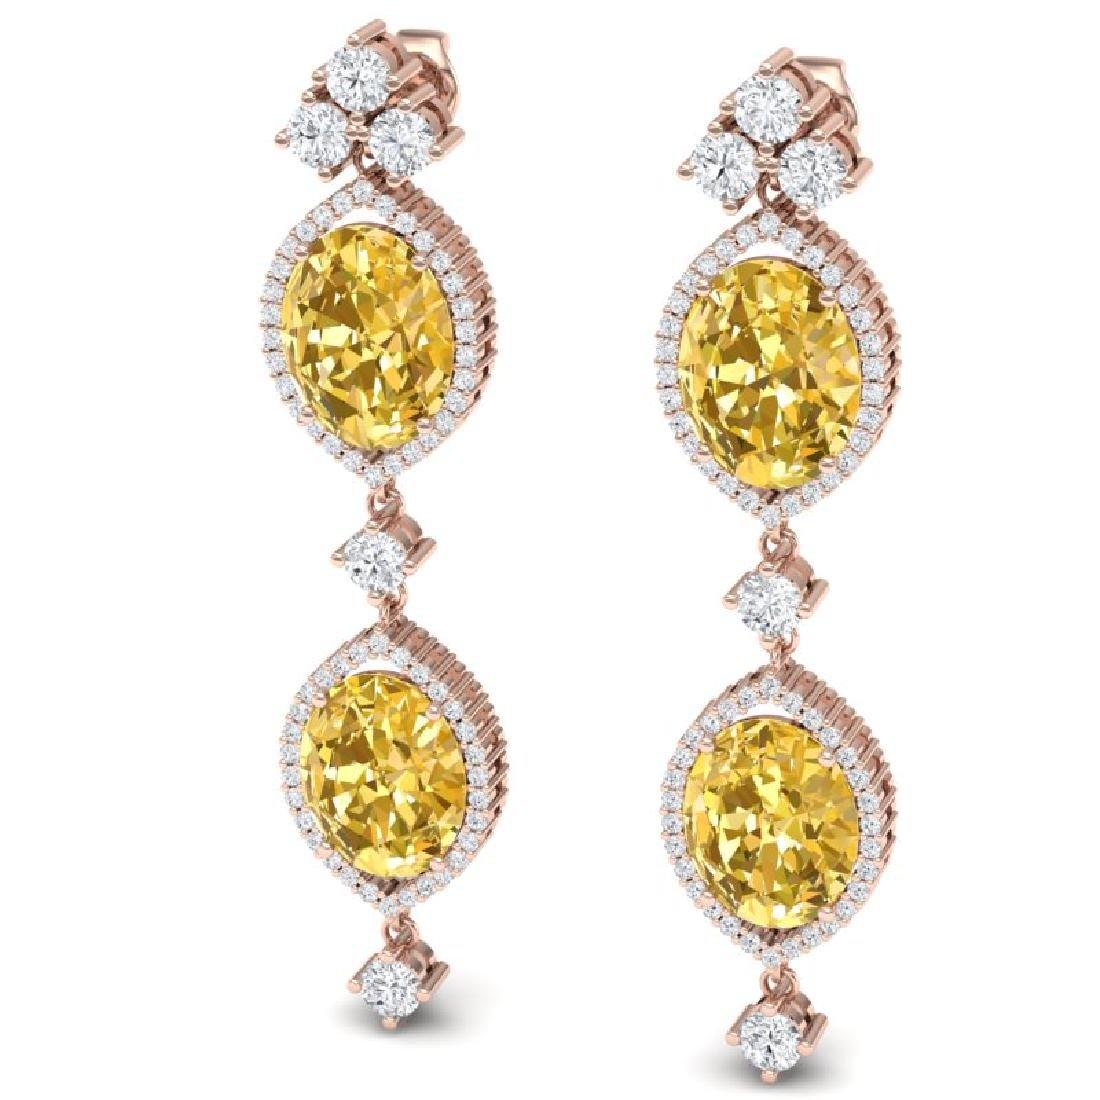 12.21 CTW Royalty Canary Citrine & VS Diamond Earrings - 2